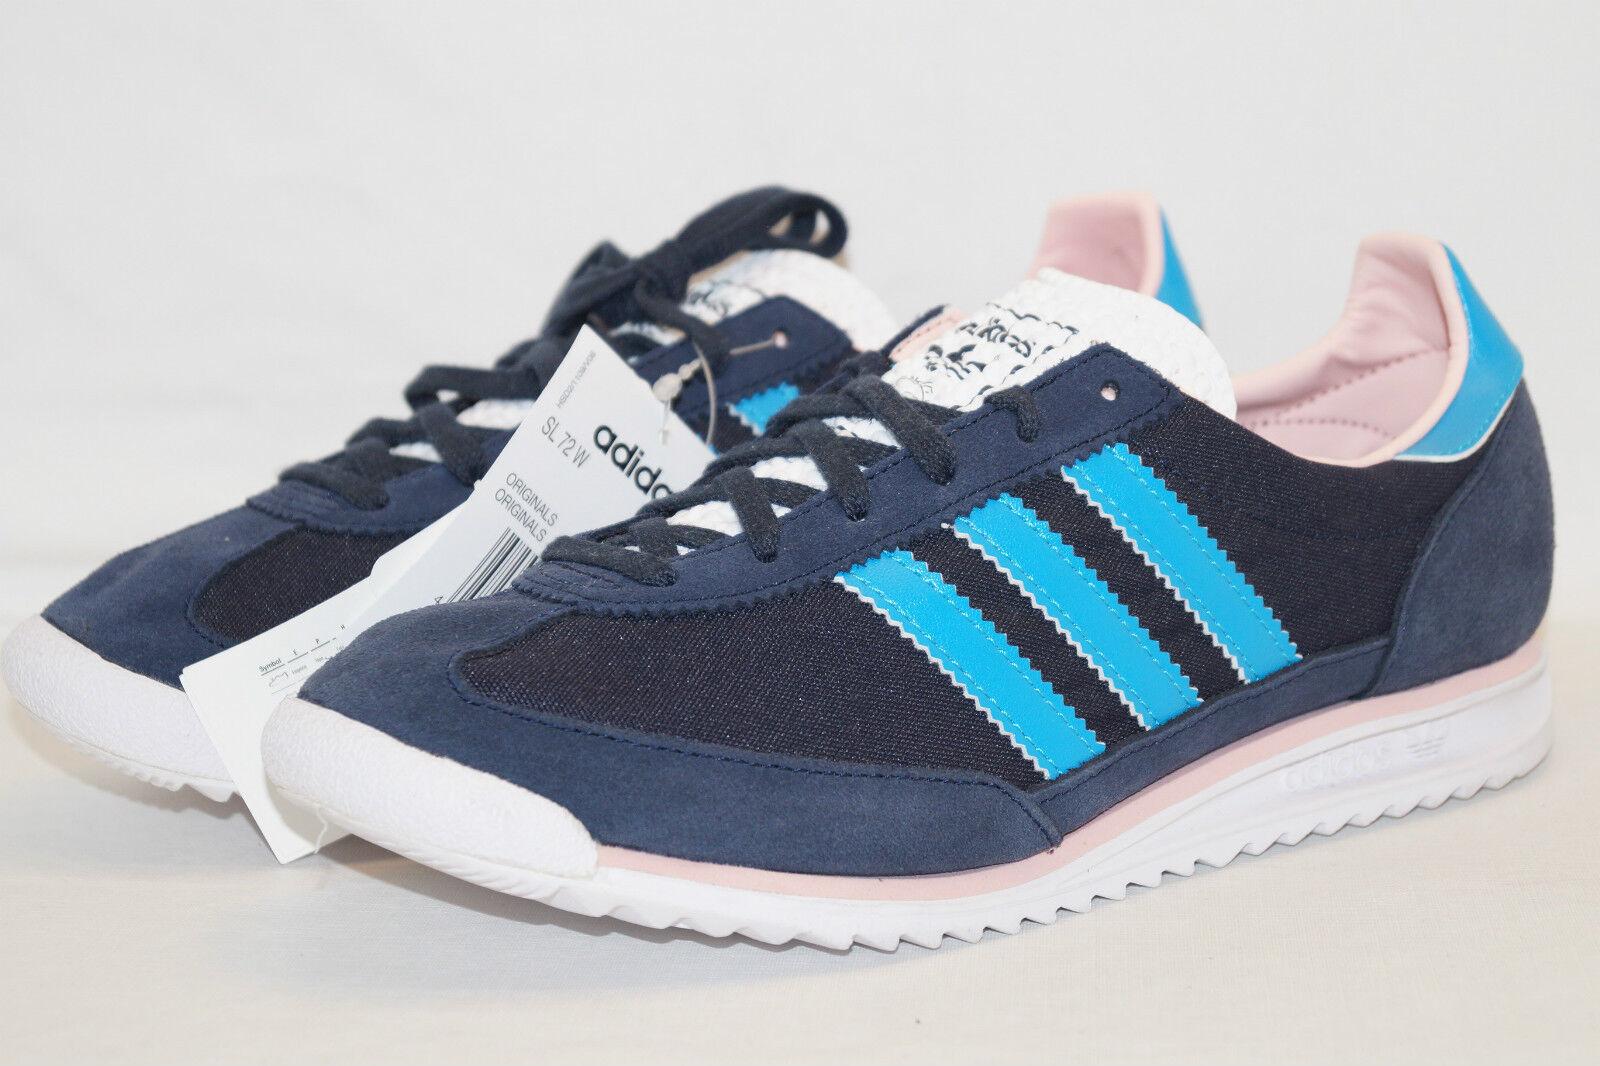 Adidas originals SL72W Damen Sneakers Q23244 dunkelblau schwarz Gr.36 UK3,5 Q23244 Sneakers 82d538